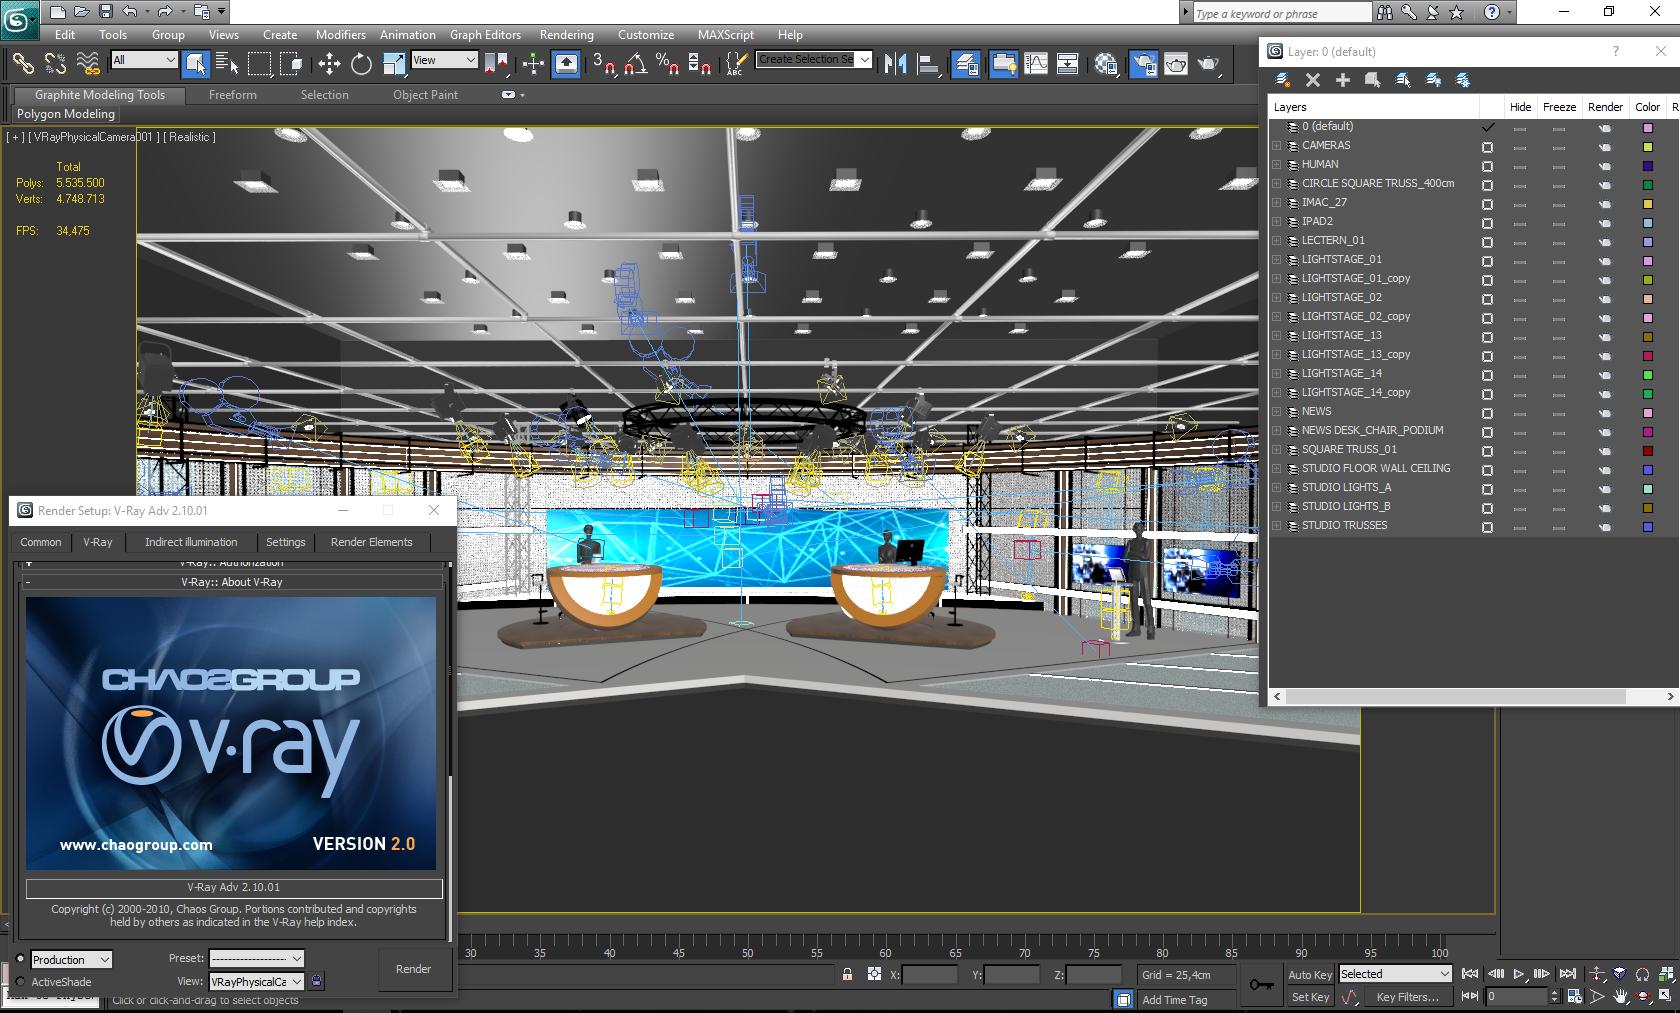 виртуал телевизийн студи цуглуулга vol 6 3d загвар max dxf dwg fbx obj 223414